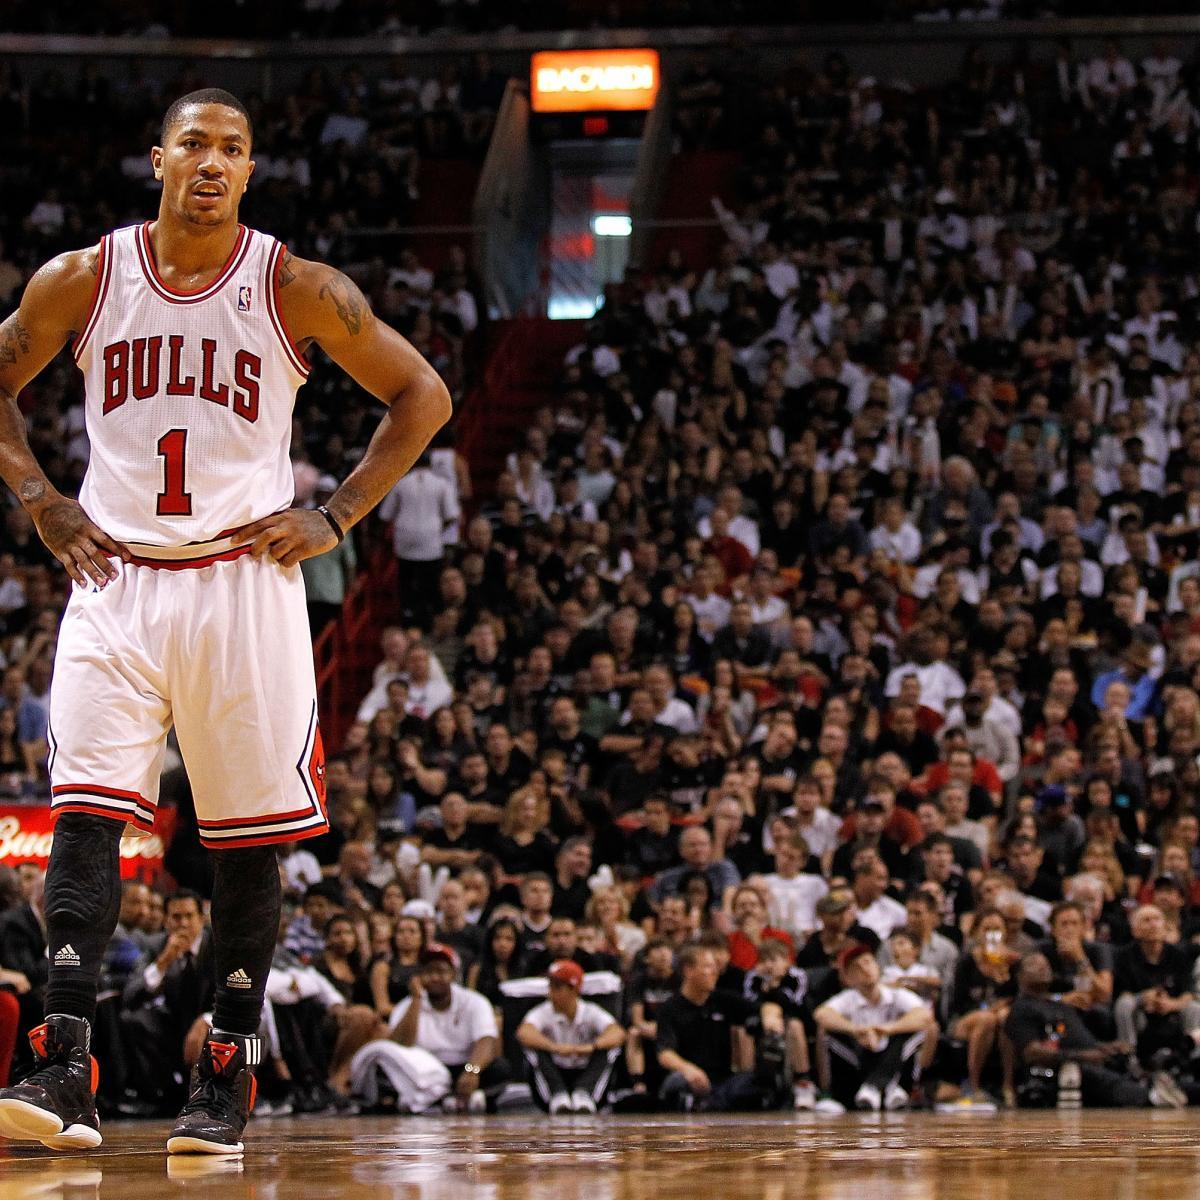 b92a51dbfcf Derrick Rose Must Channel Michael Jordan to Win an NBA Championship ...